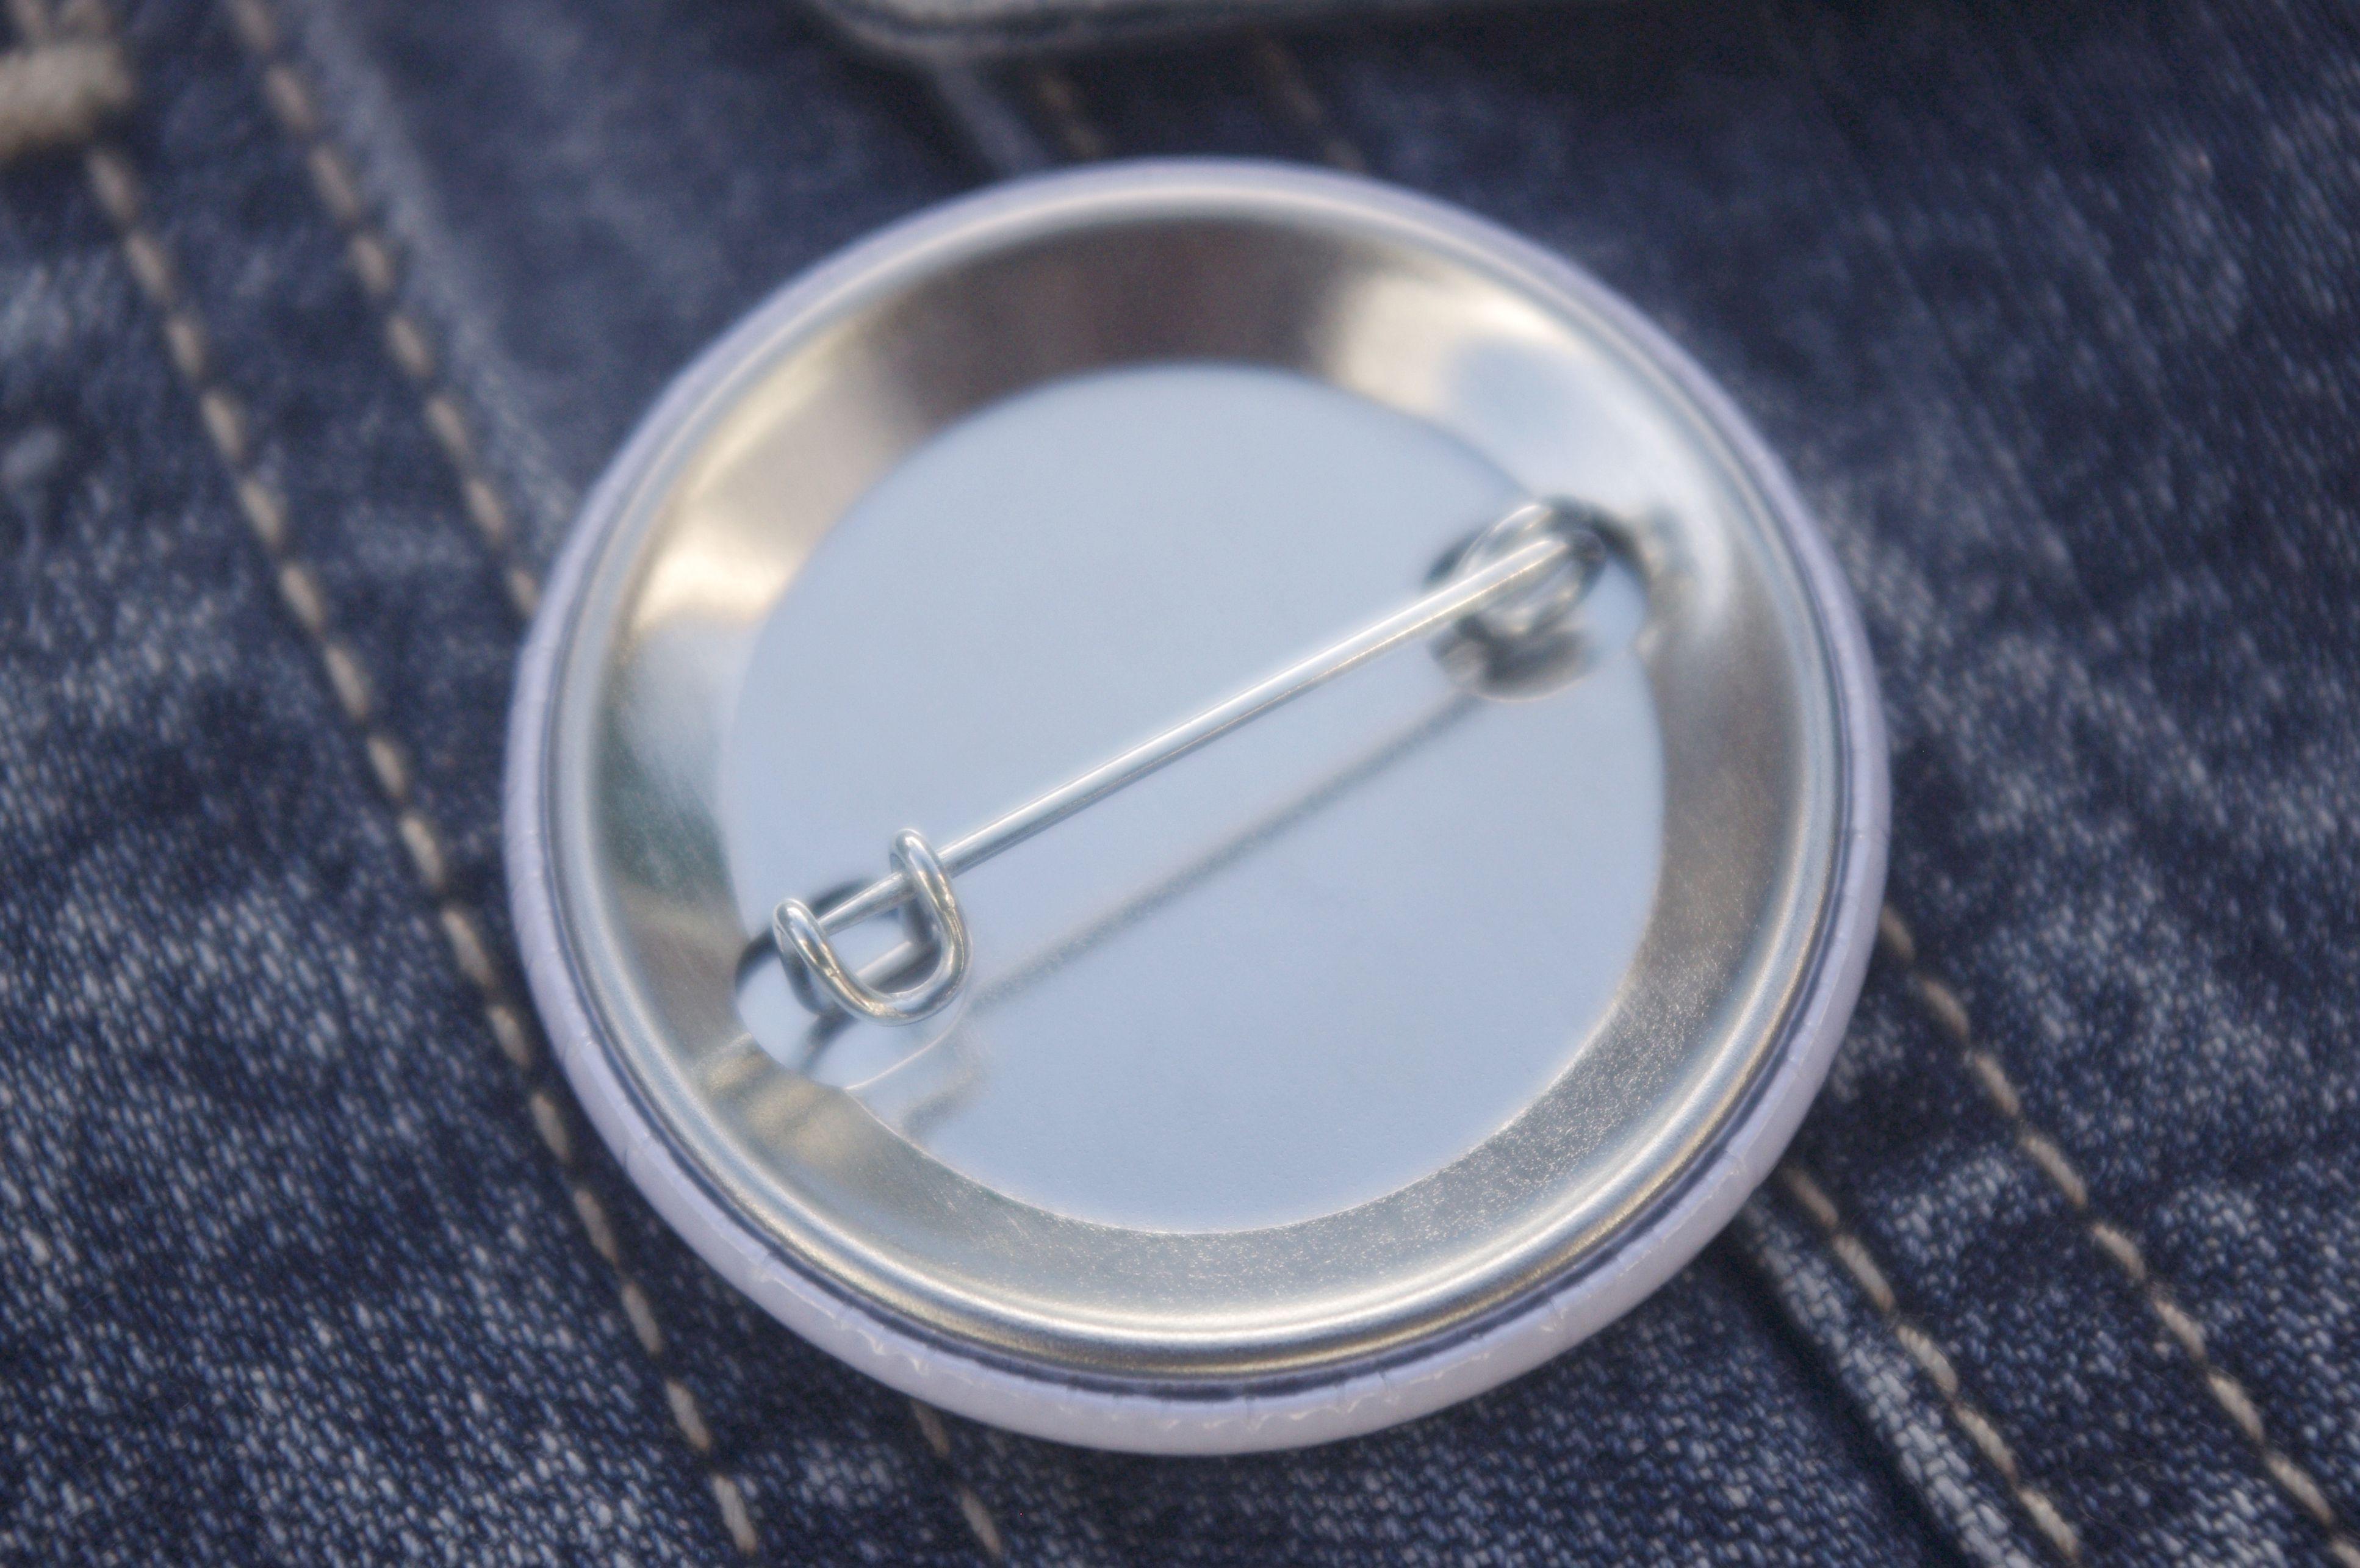 accessories sea gift pin handmade saline badges pinbadge badge alternative octopus tattoo clothing art